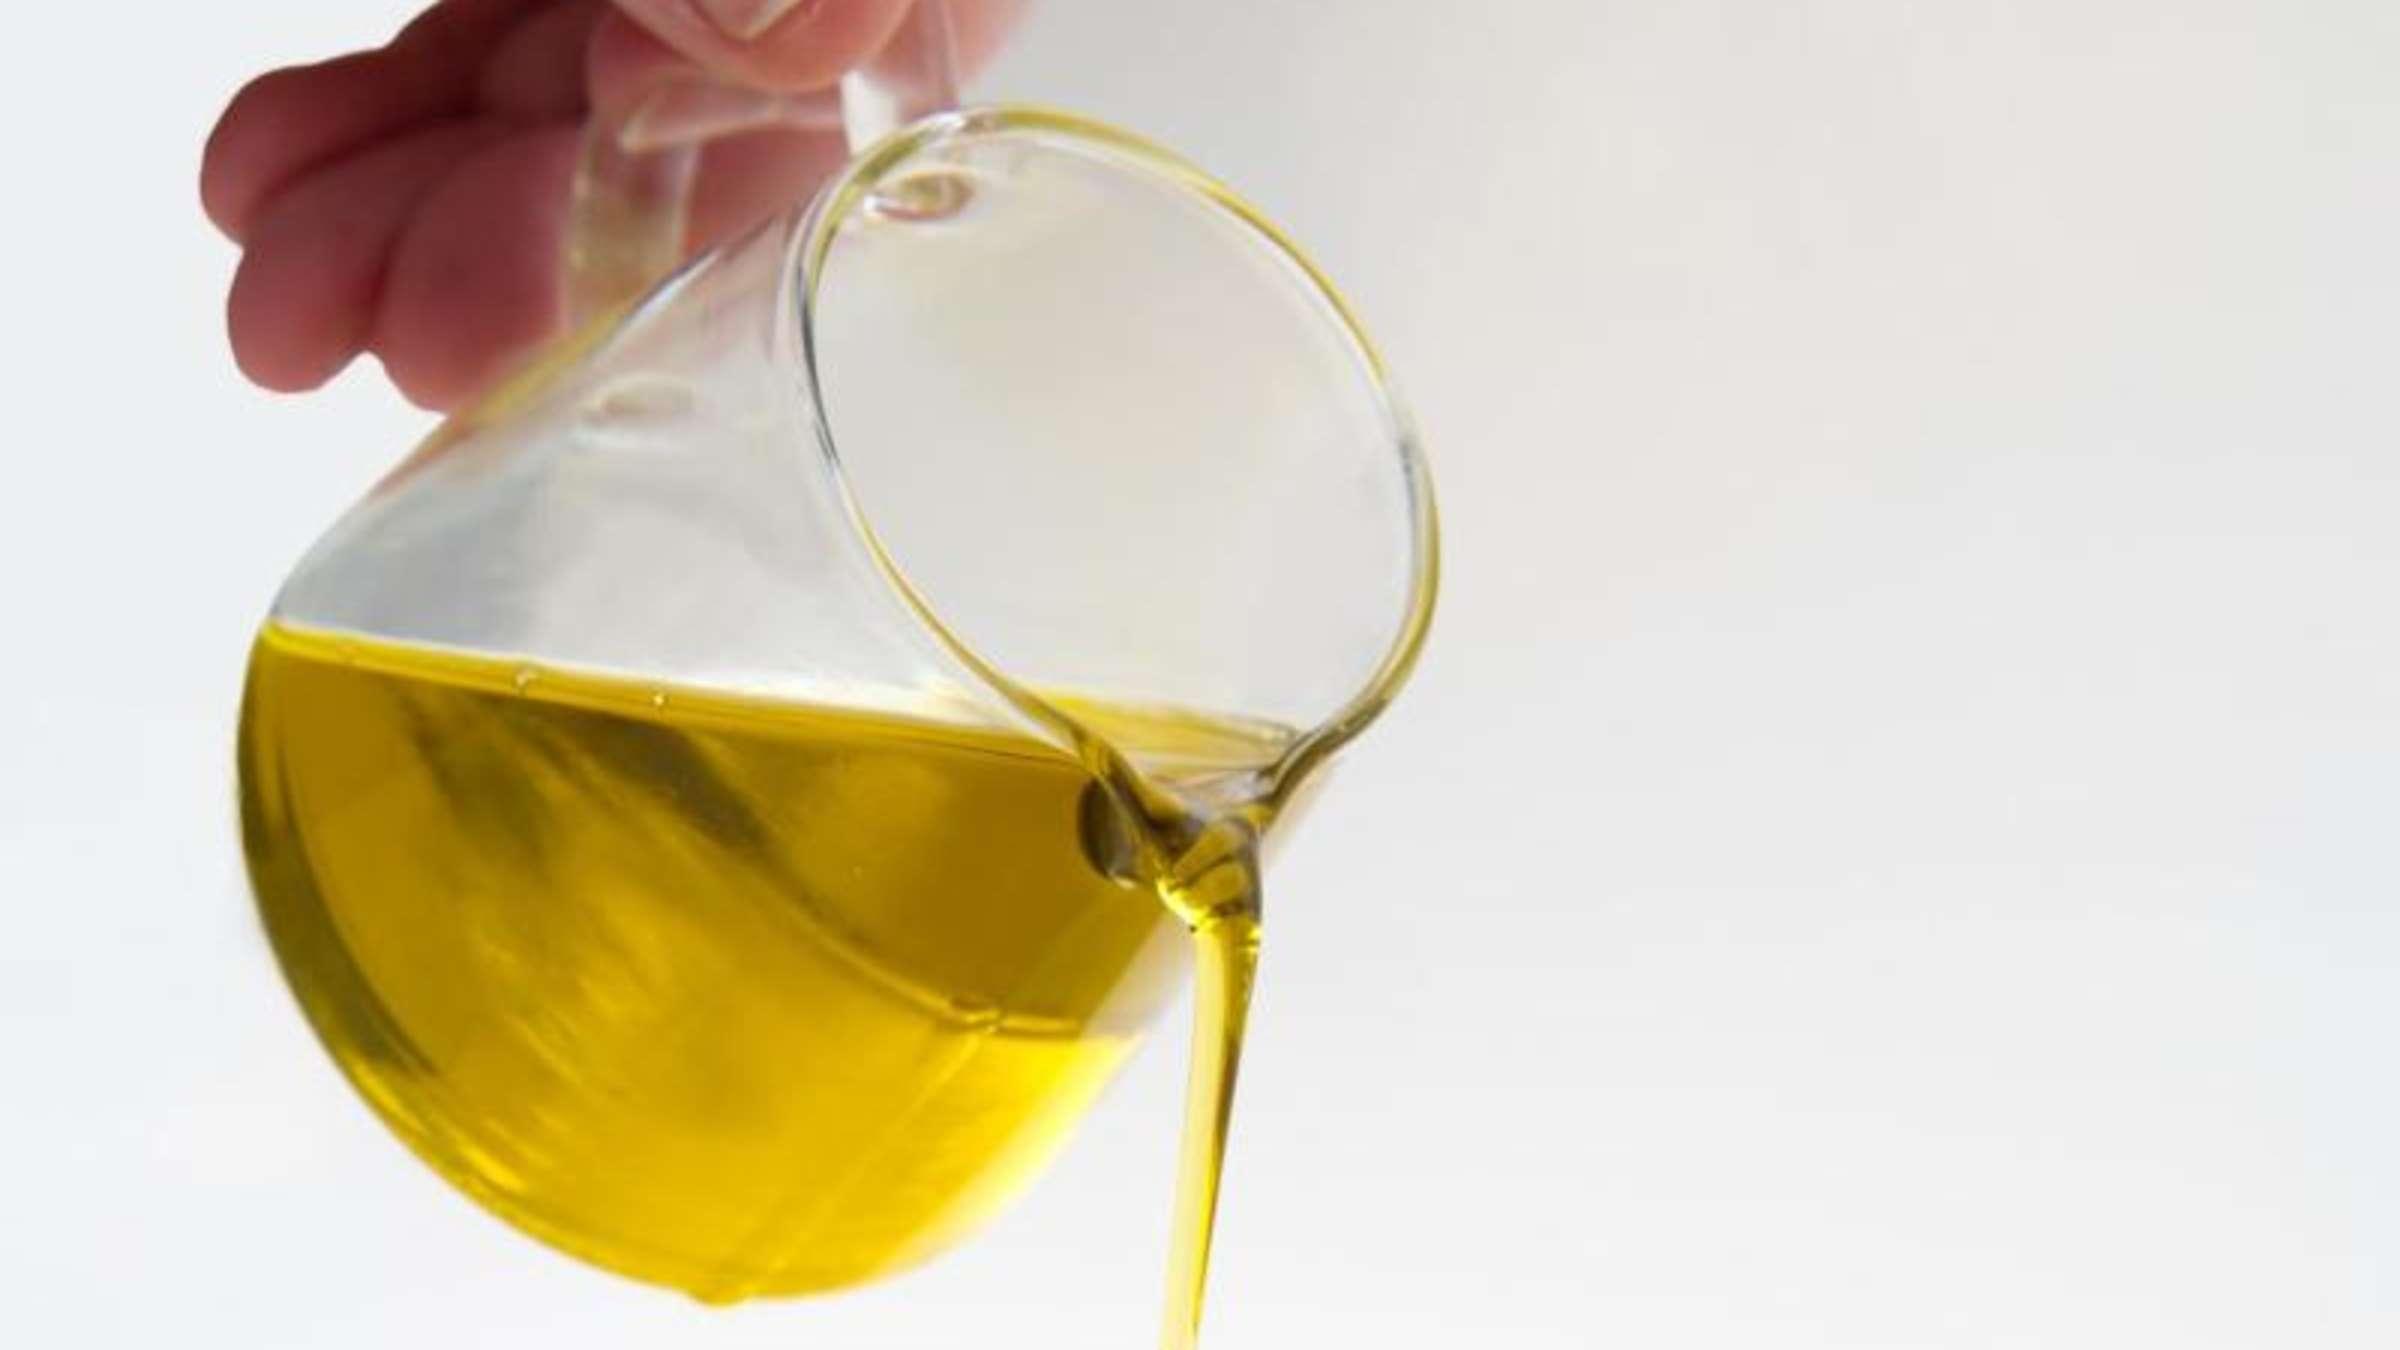 Stiftung warentest olivenöl 2020